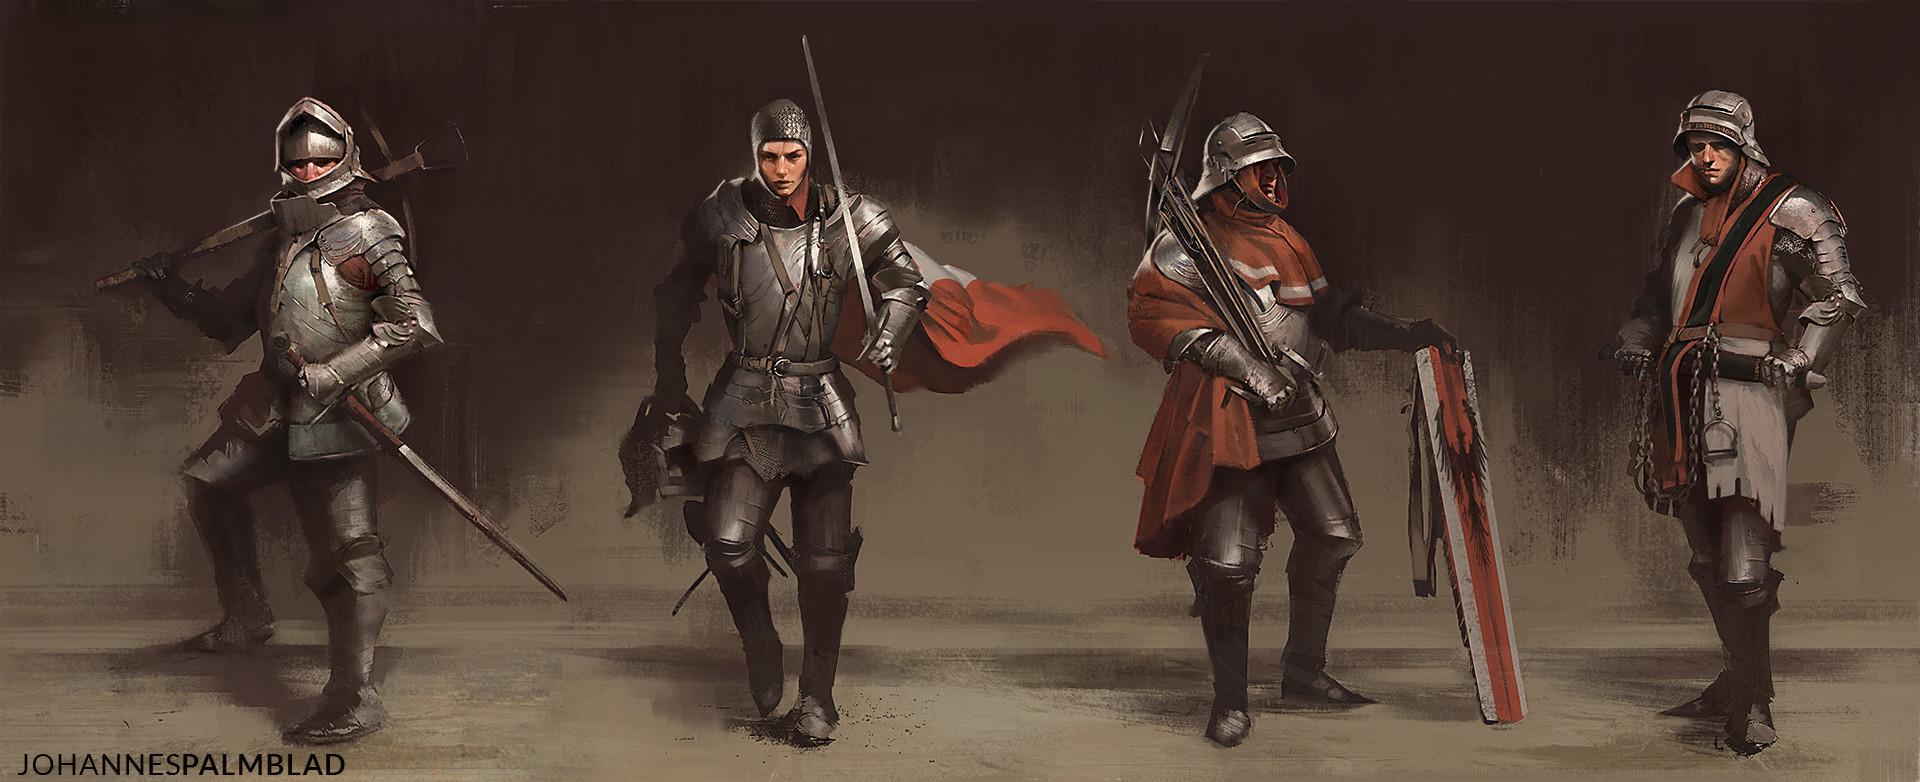 Johannes palmblx knightsguard05